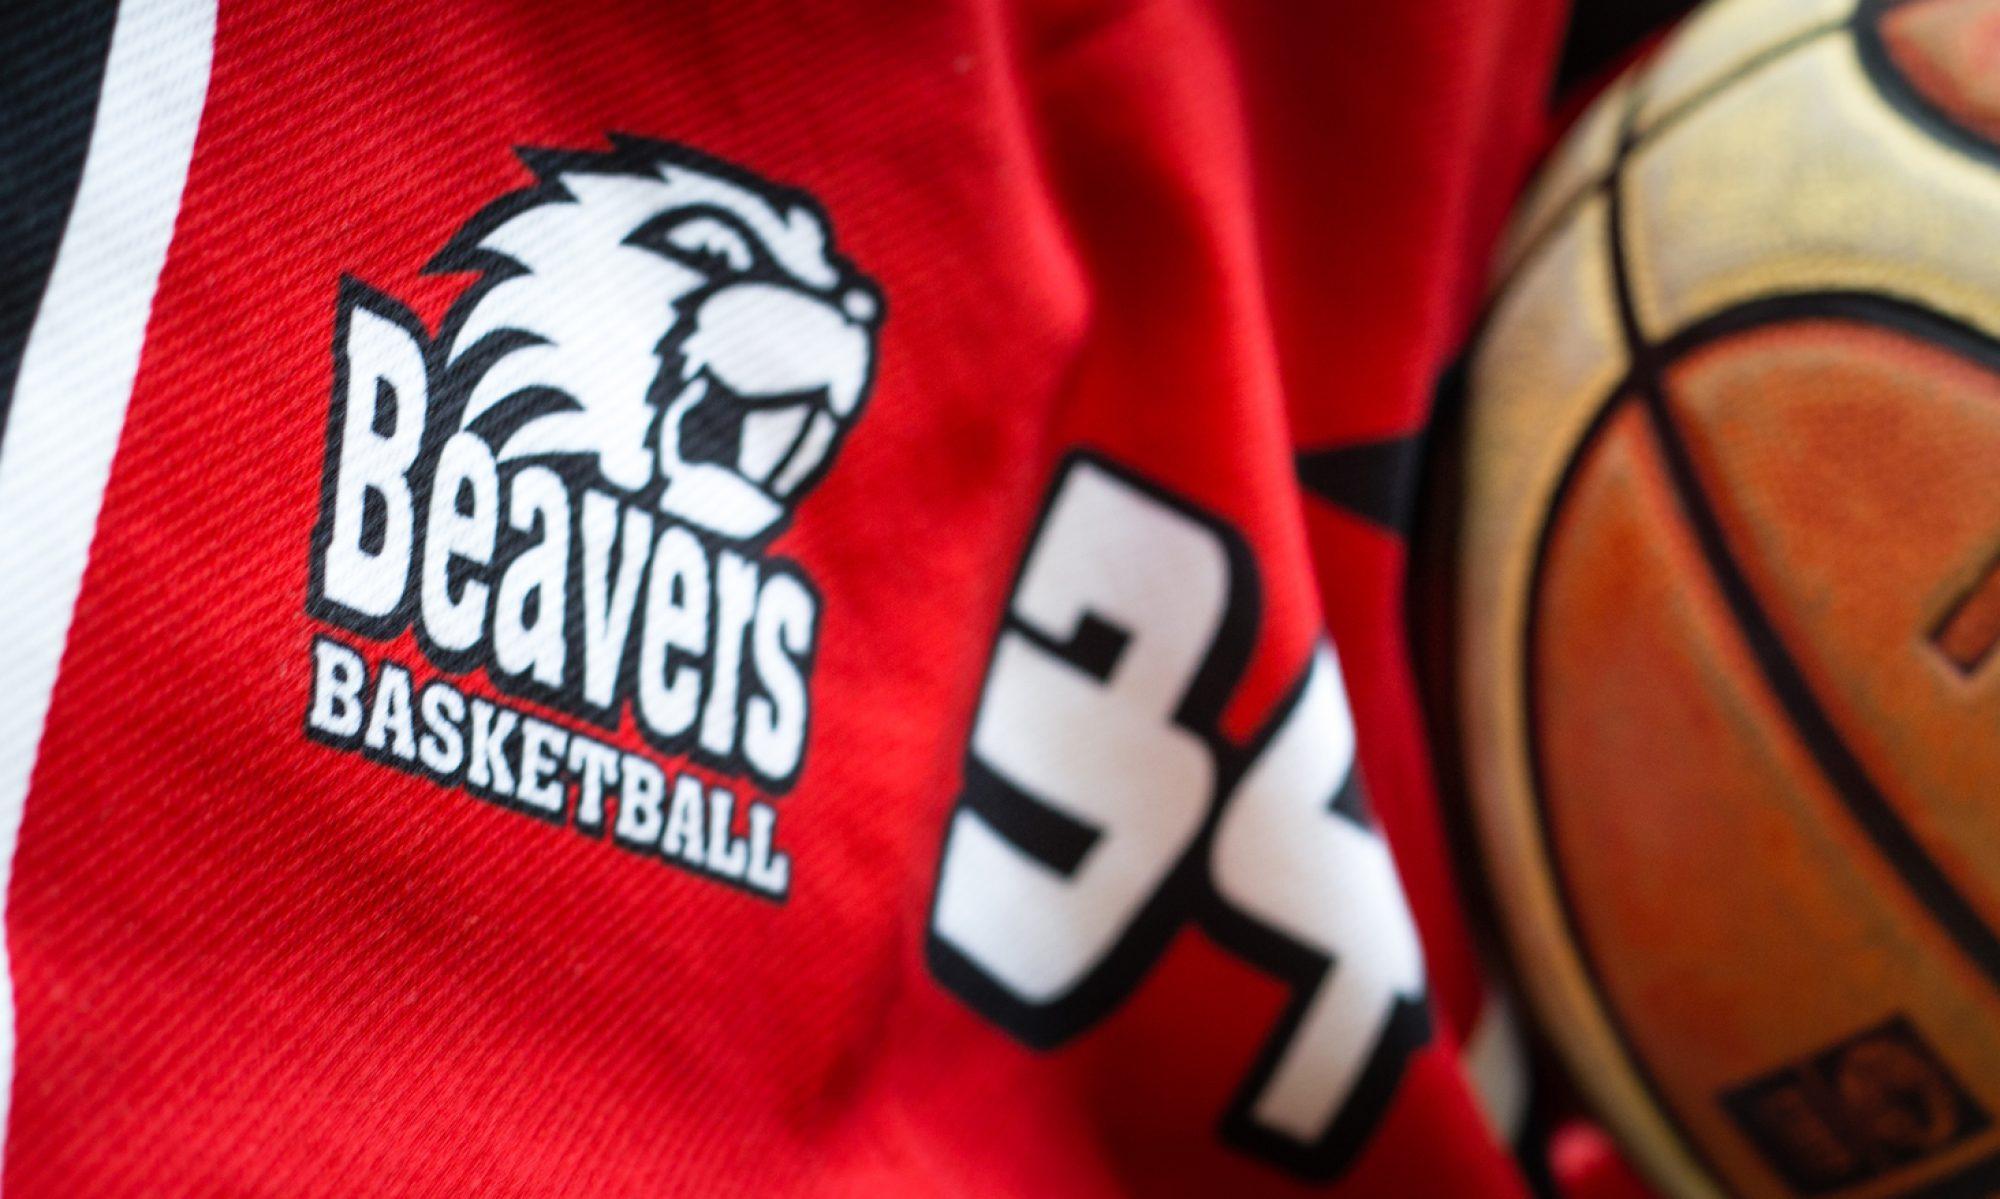 Beavers Basketball Club Bendigo